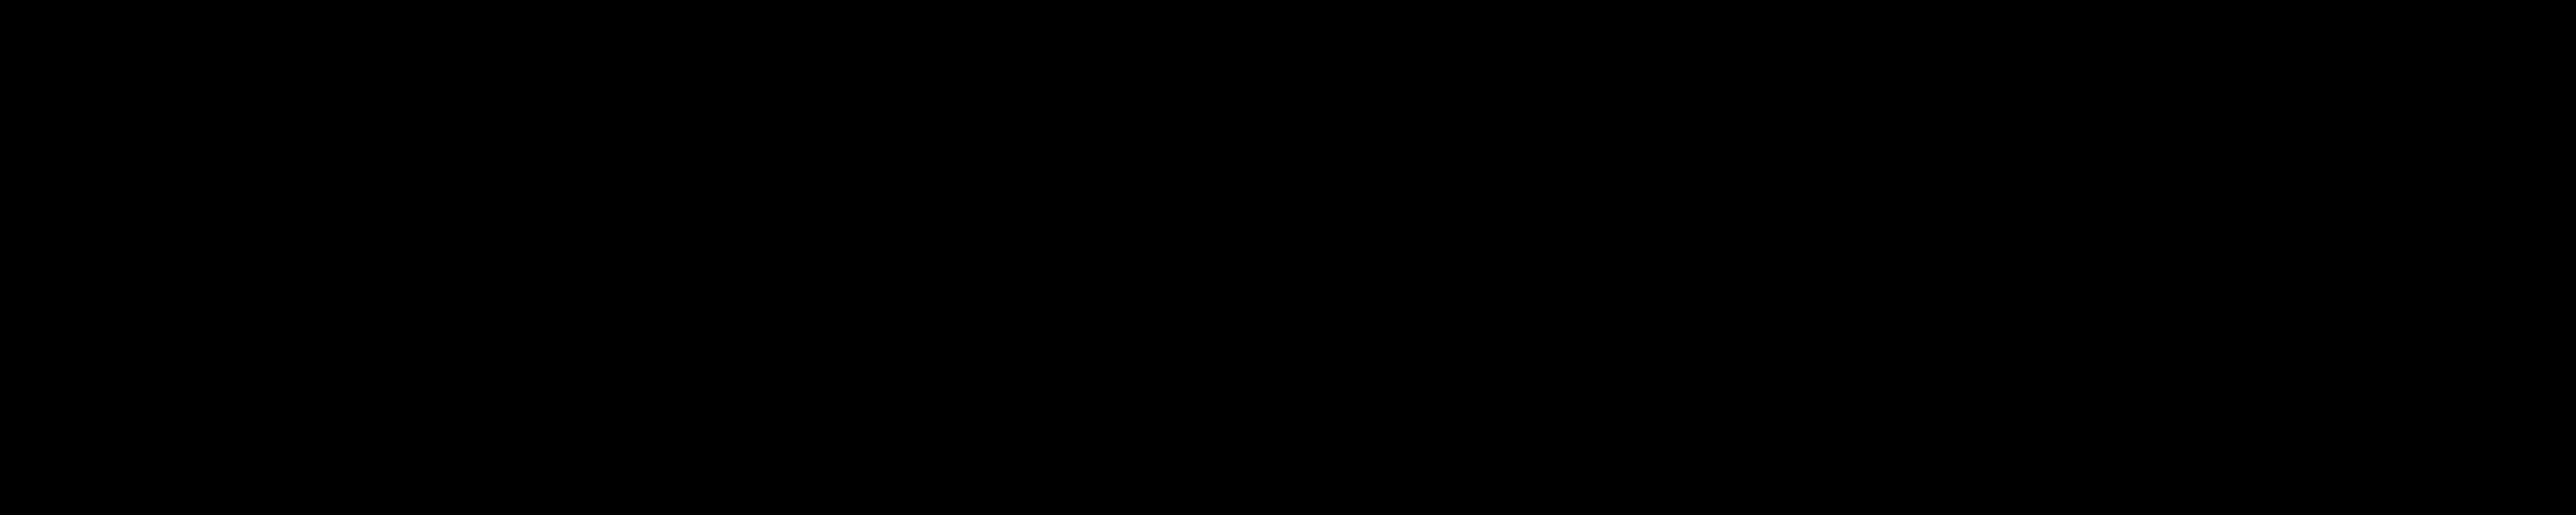 BINANPASTA